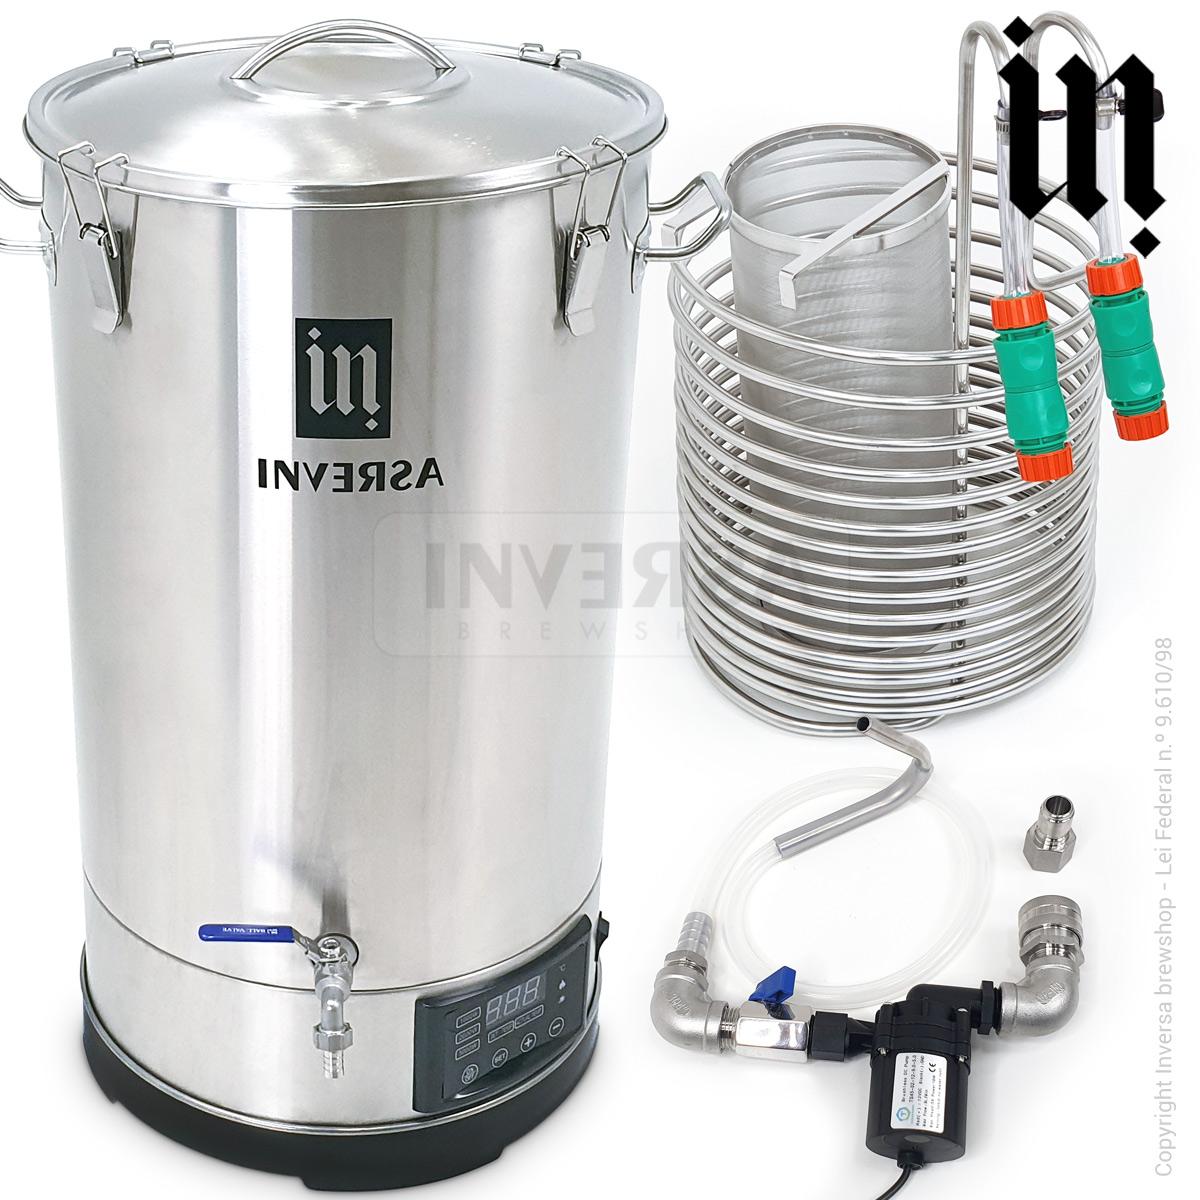 MicroCervejaria Inversa 65 litros (Single Vessel / BIAB) - Deluxe 2020